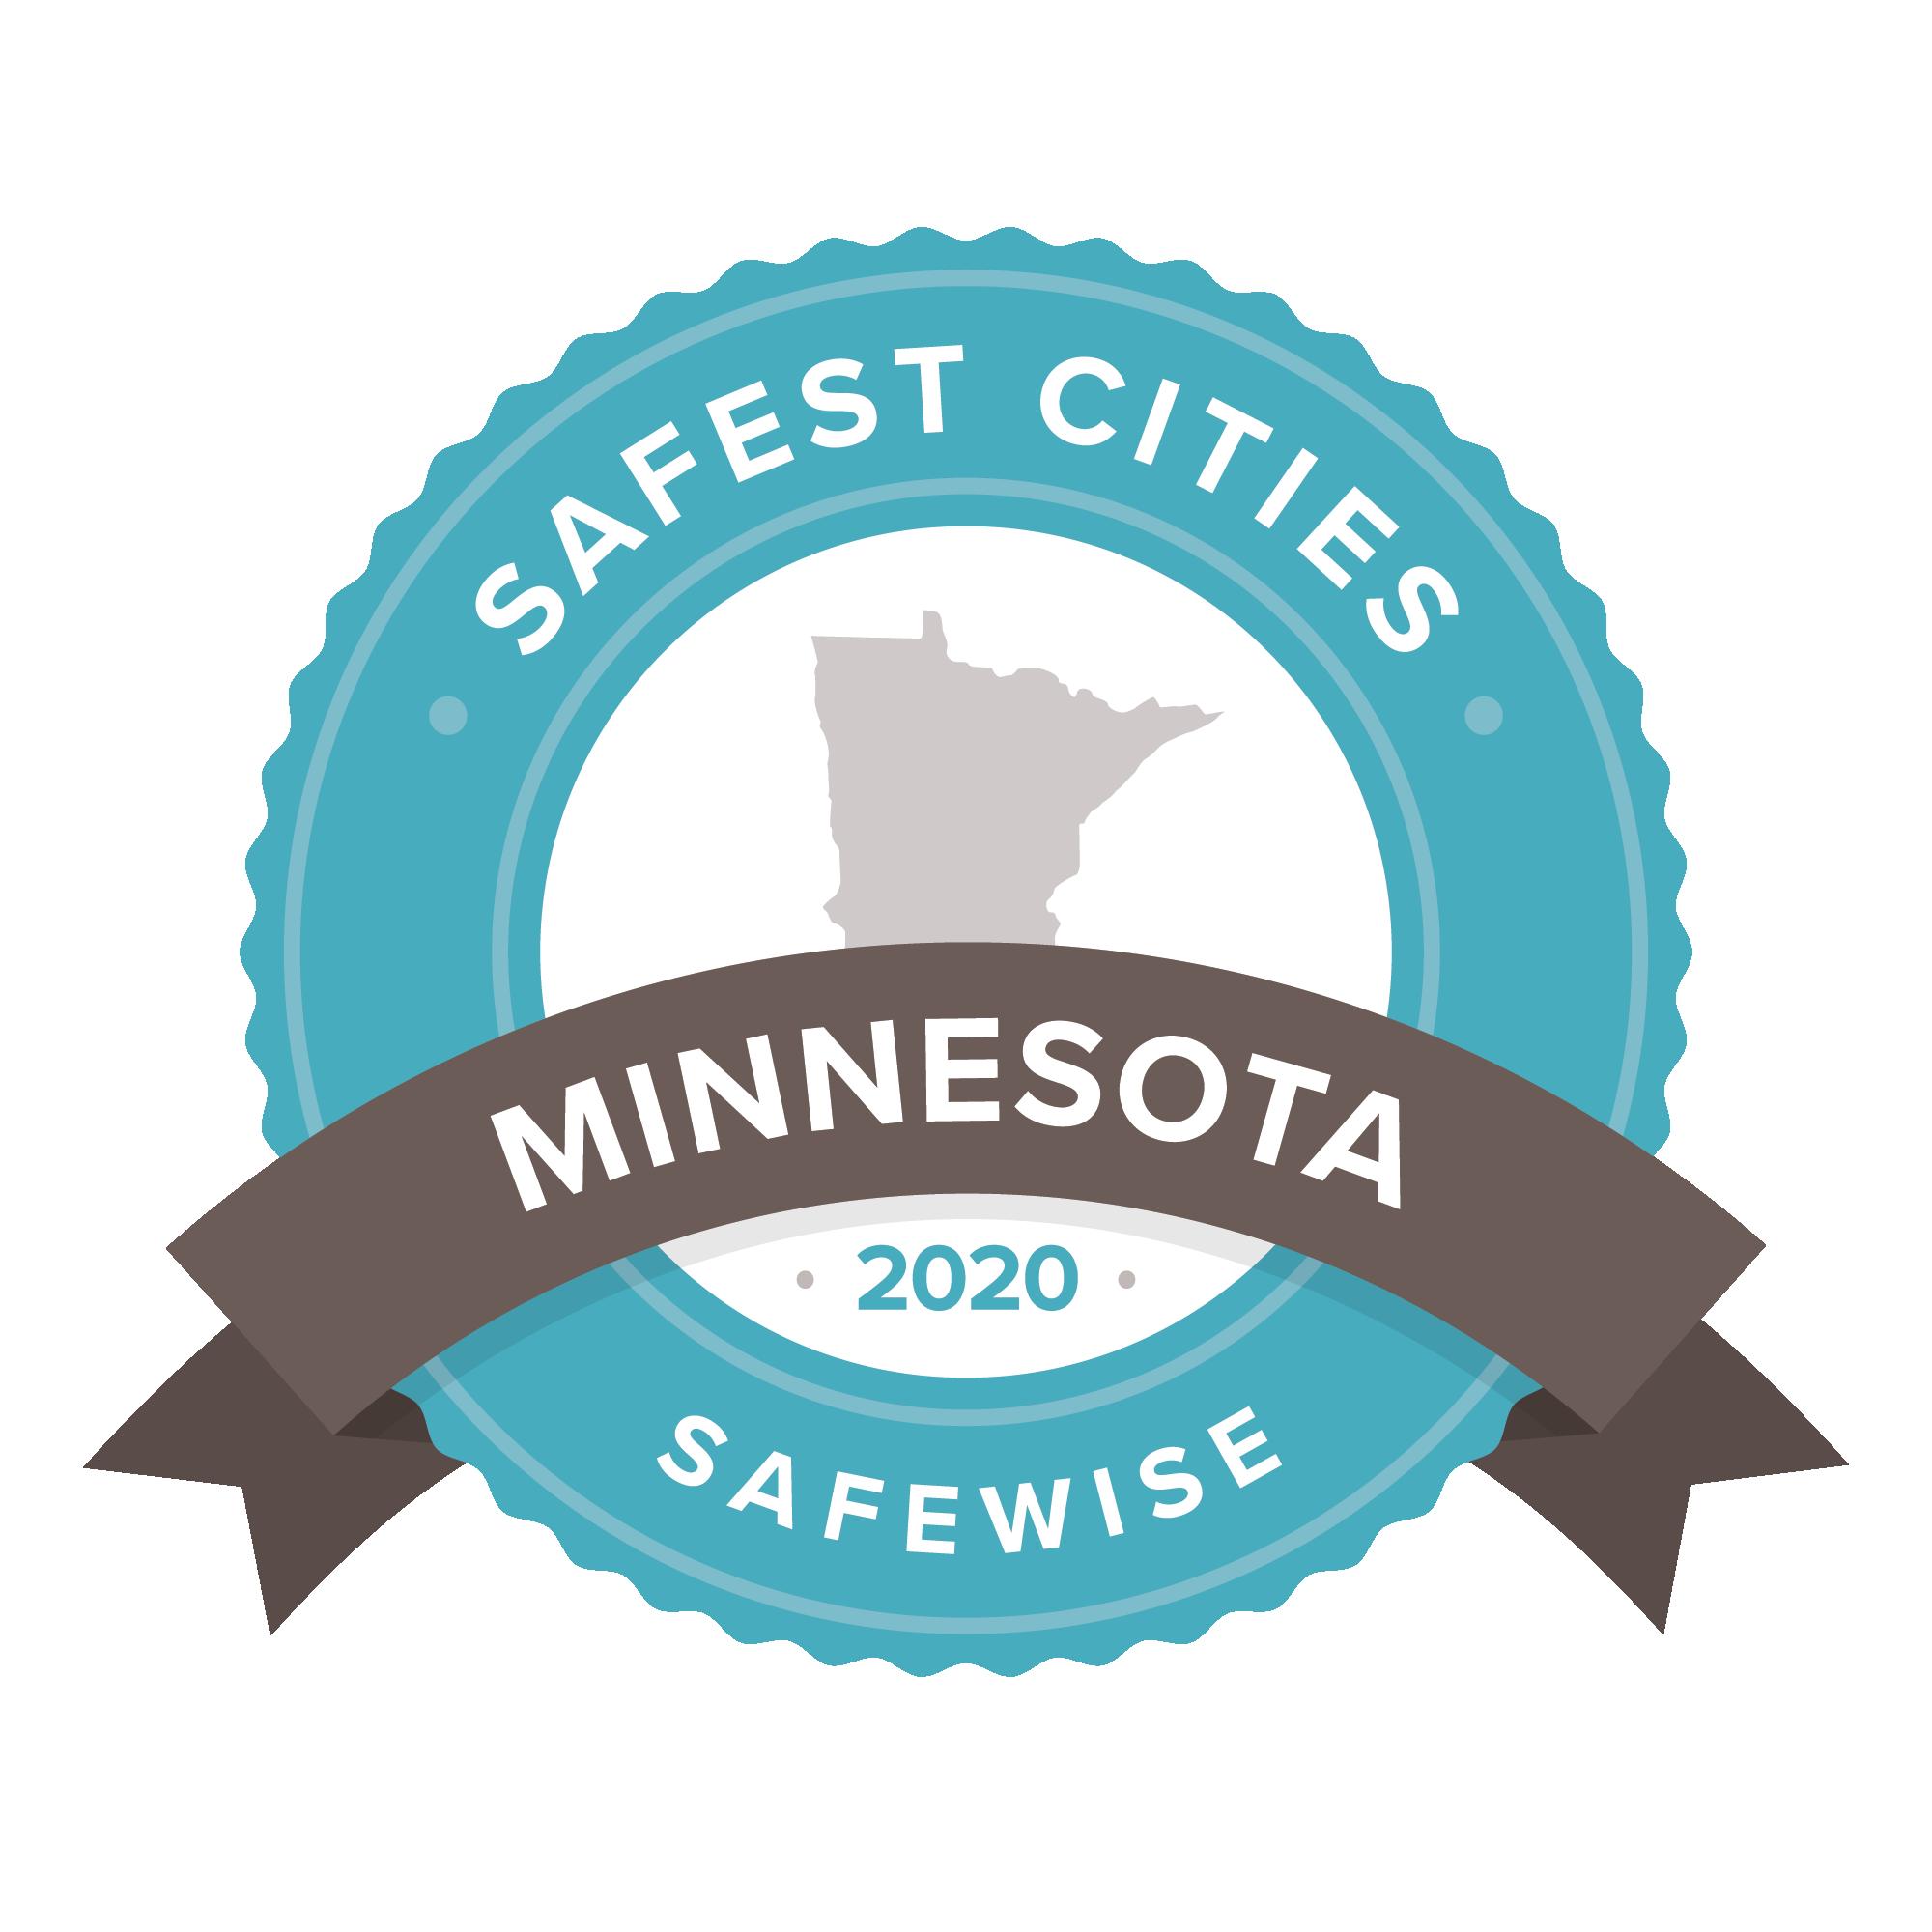 Minnesota safest cities badge